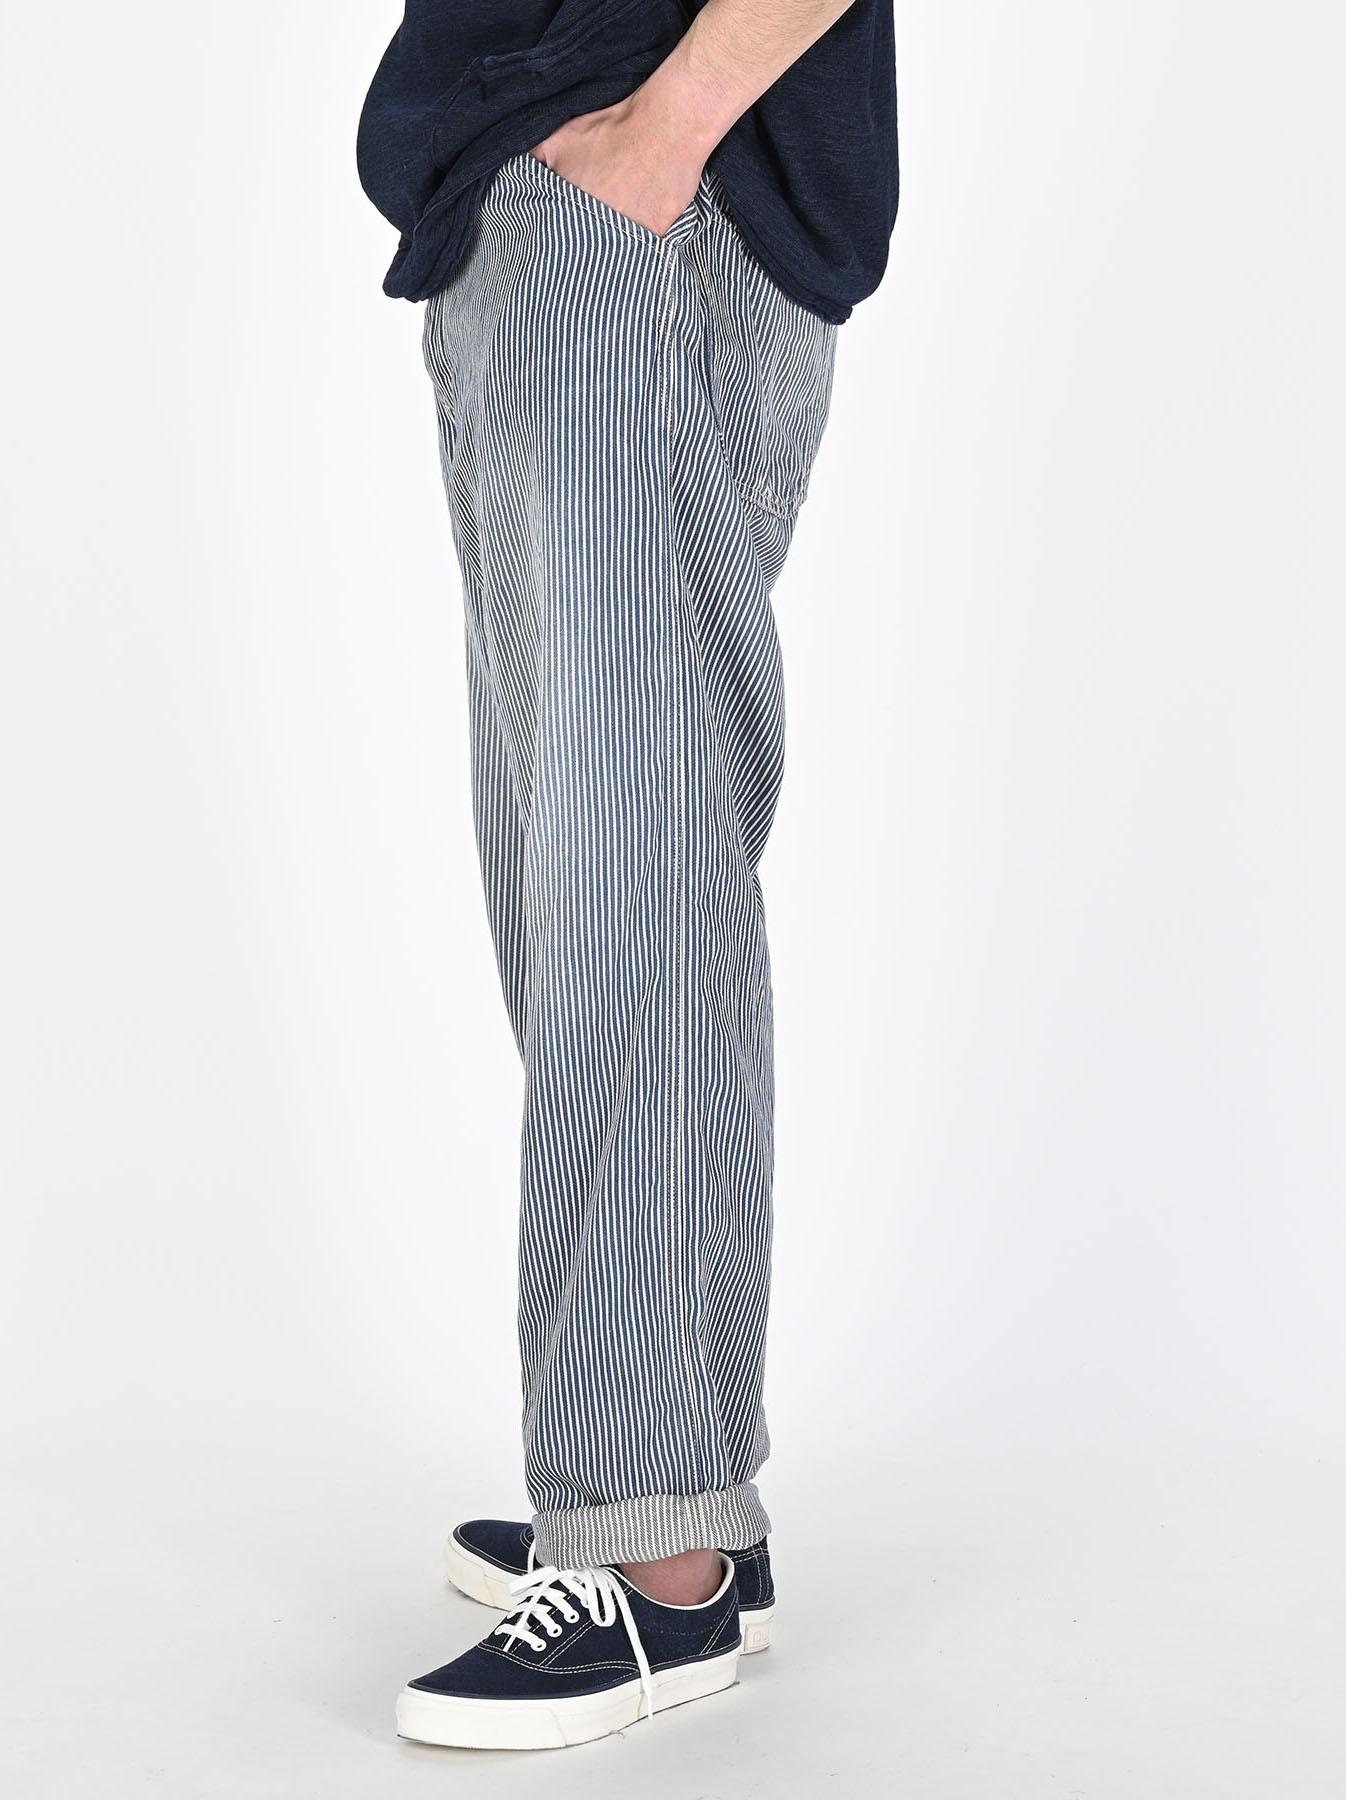 Indigo 908 Painter Pants Distressed (0721)-7